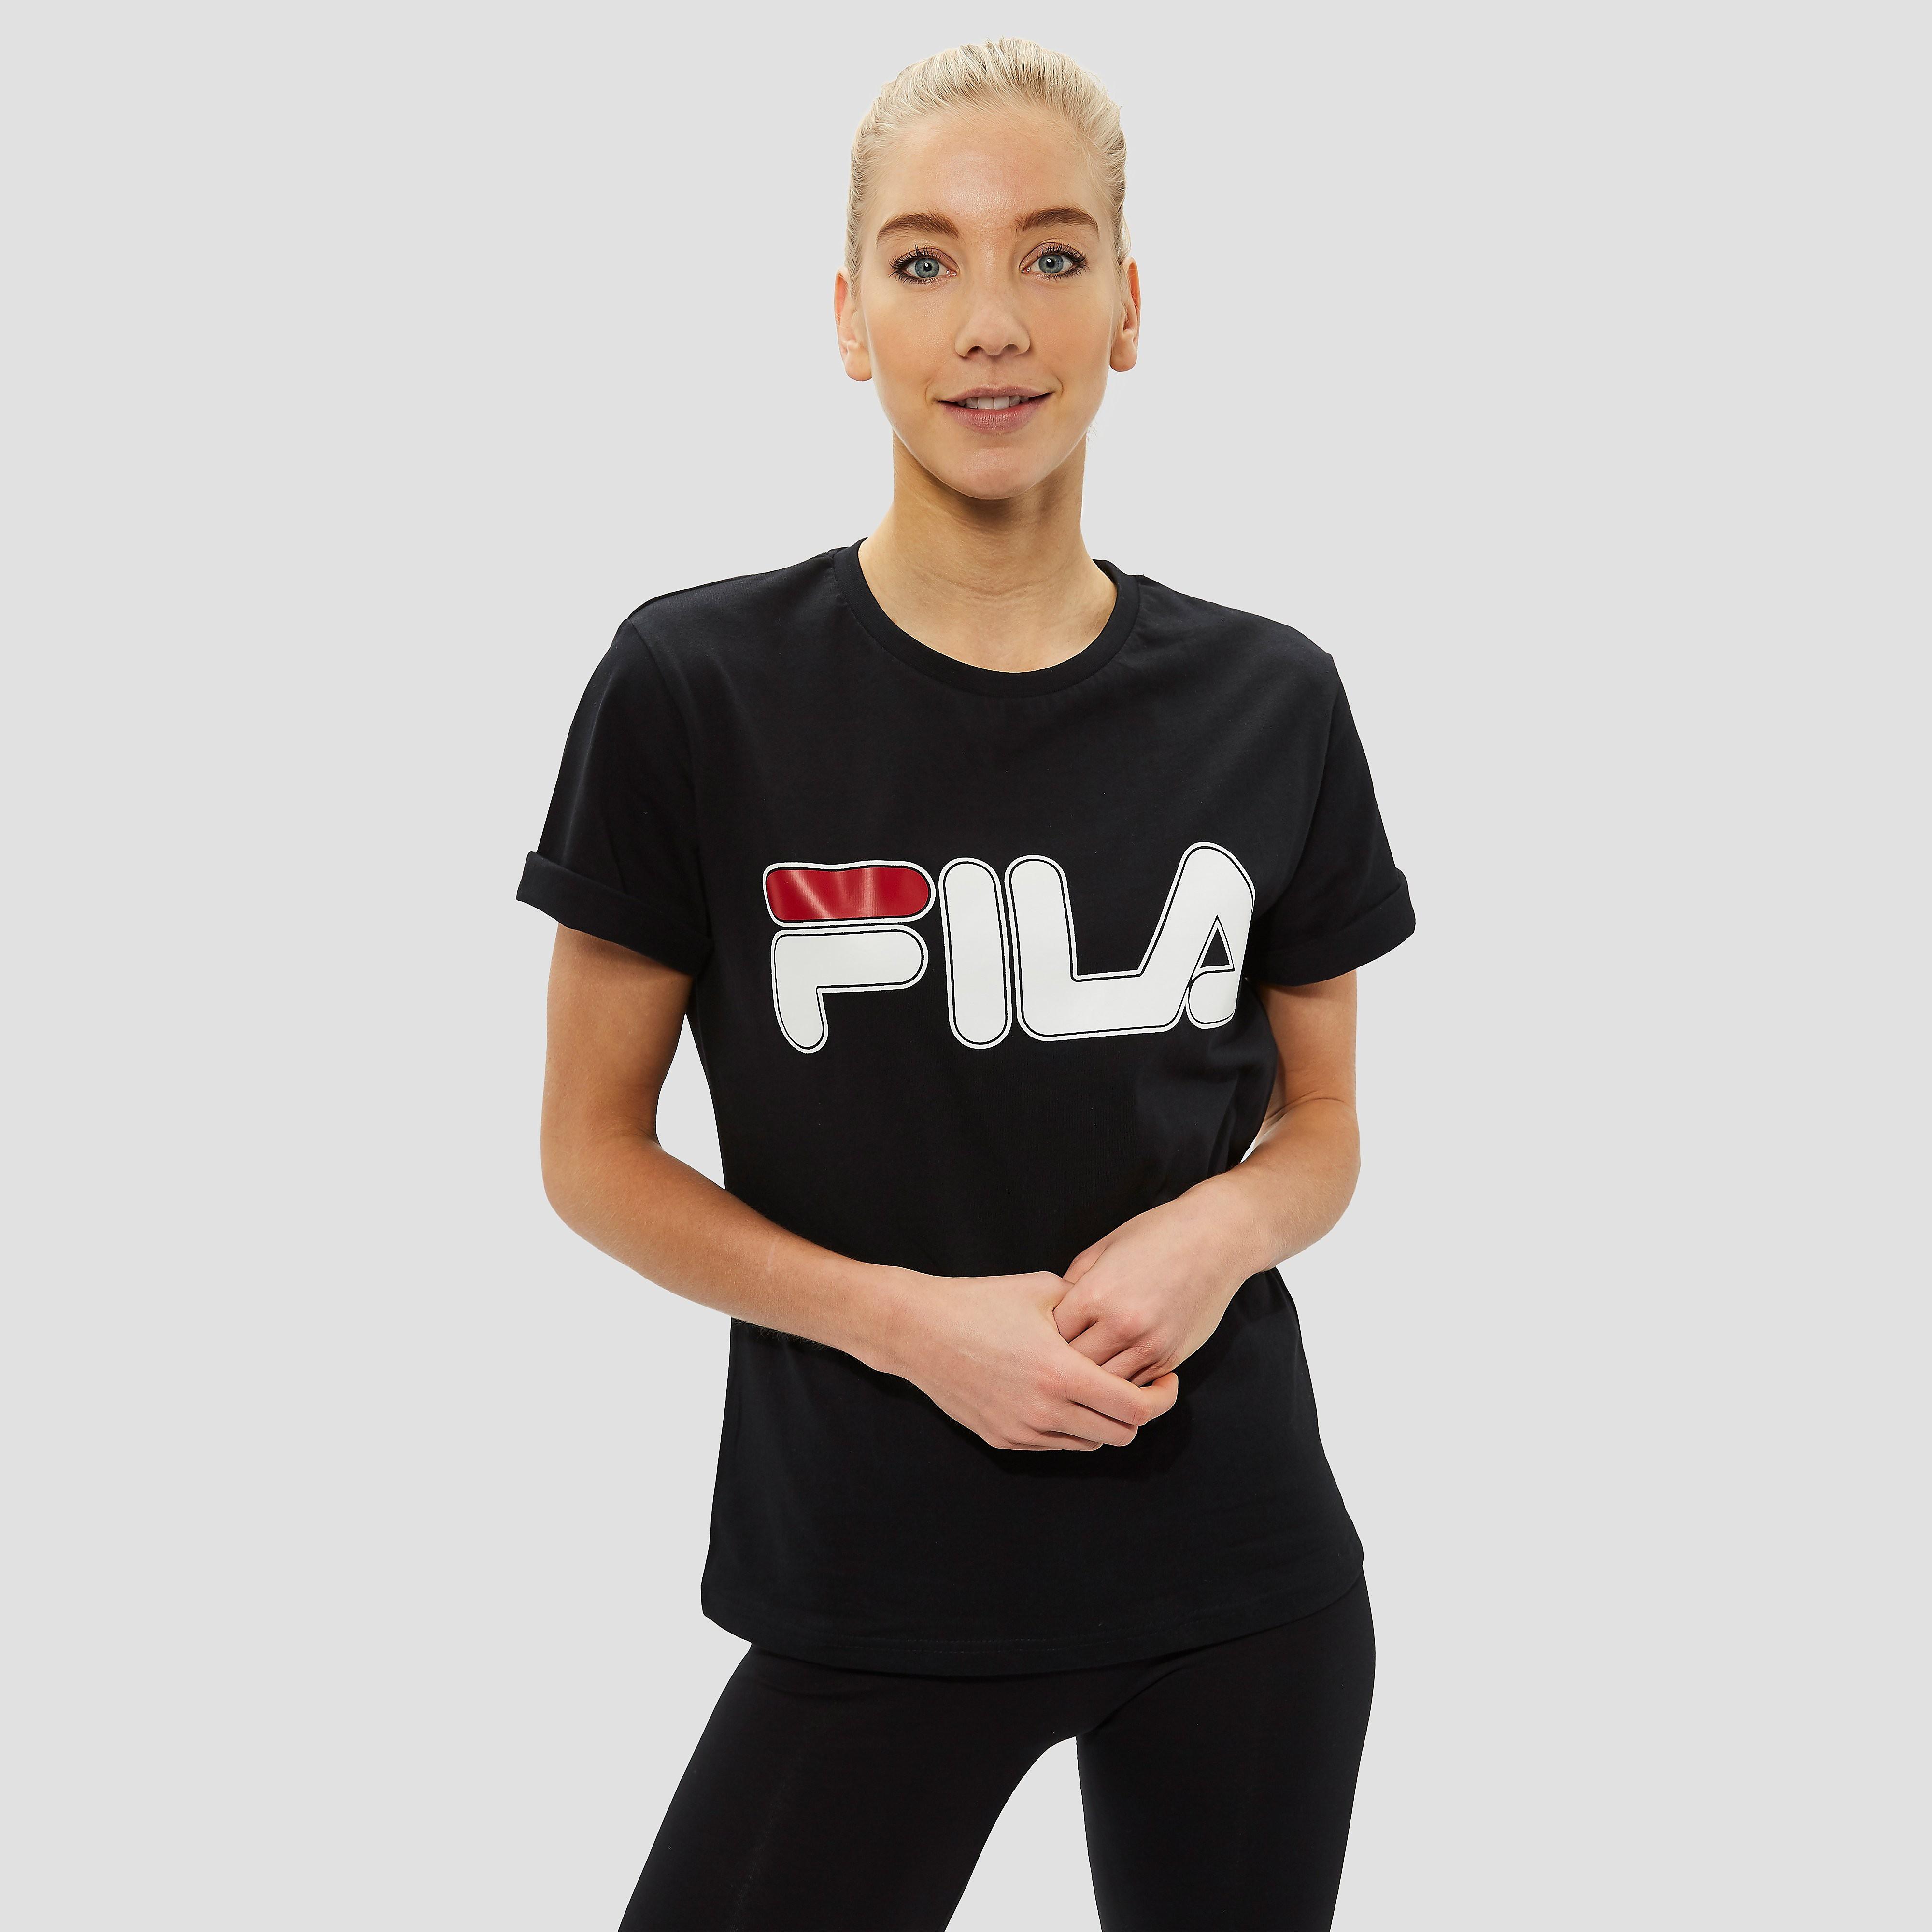 FILA GIULIA SHIRT ORANJE DAMES